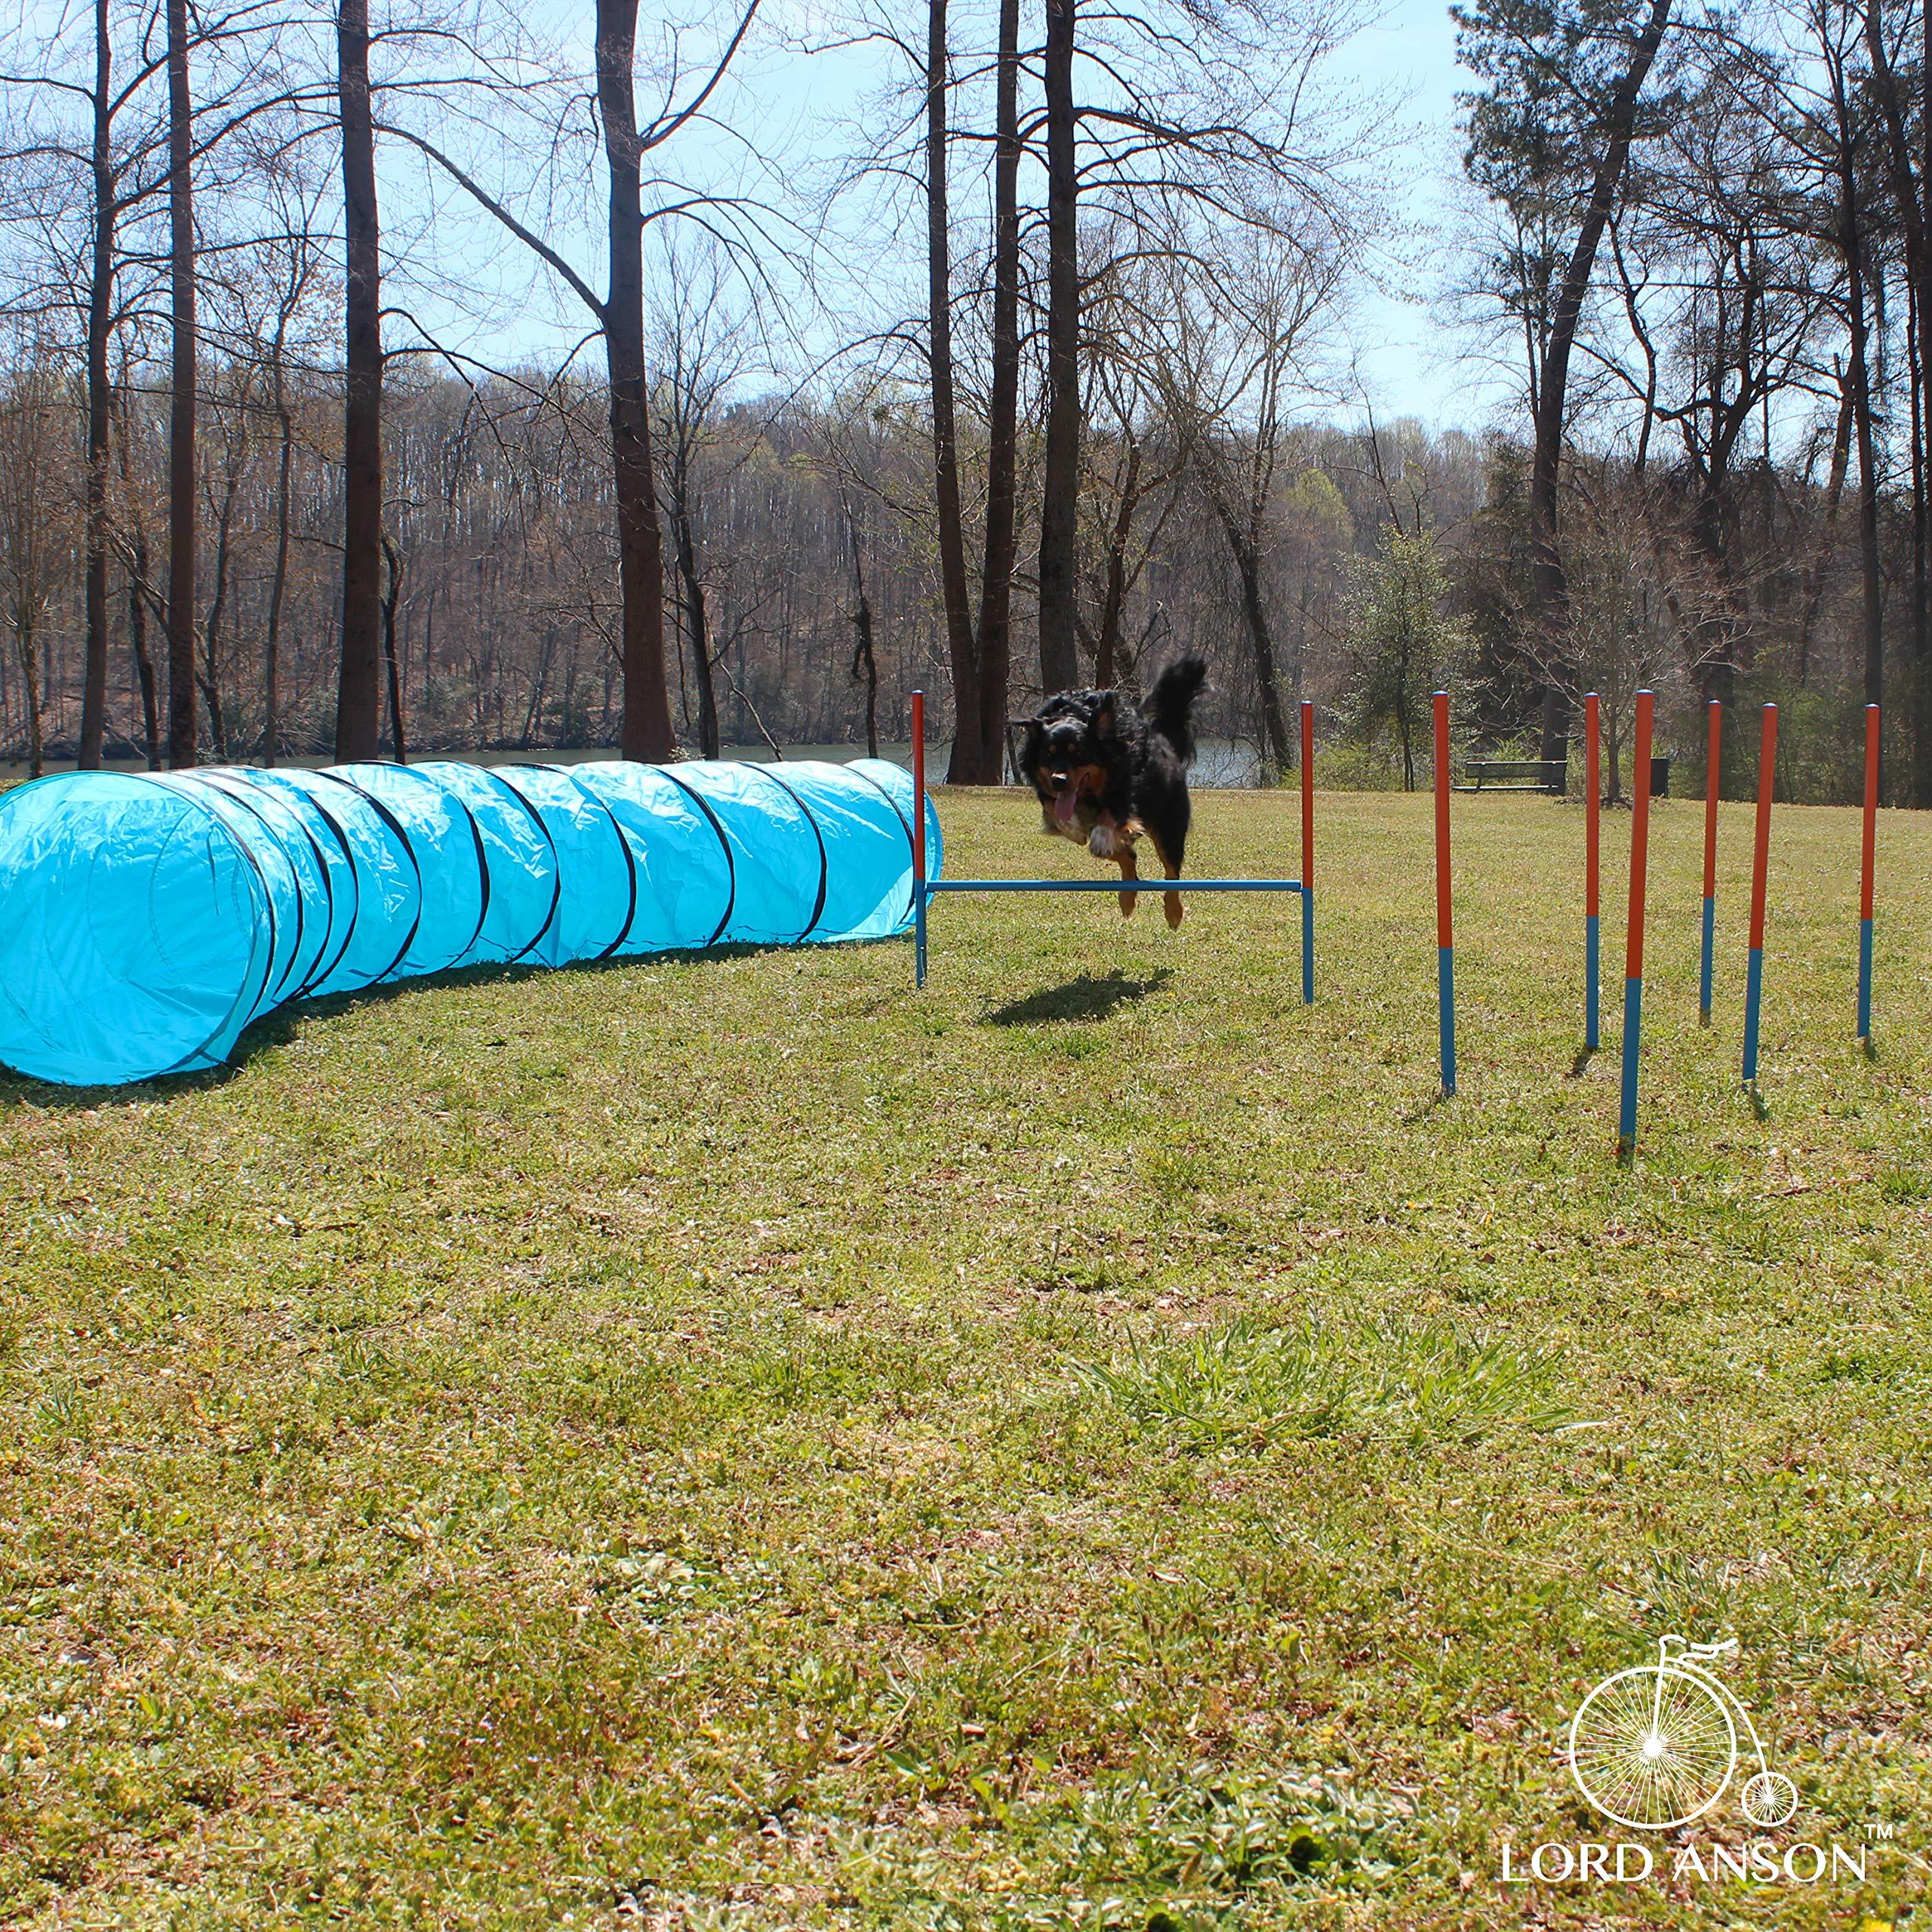 Lord AnsonTM Dog Agility Set - Dog Agility Equipment - 1 Dog Tunnel, 6 Weave Poles, 1 Dog Agility Jump - Canine Agility Set for Dog Training, Obedience, Rehabilitation by Lord Anson